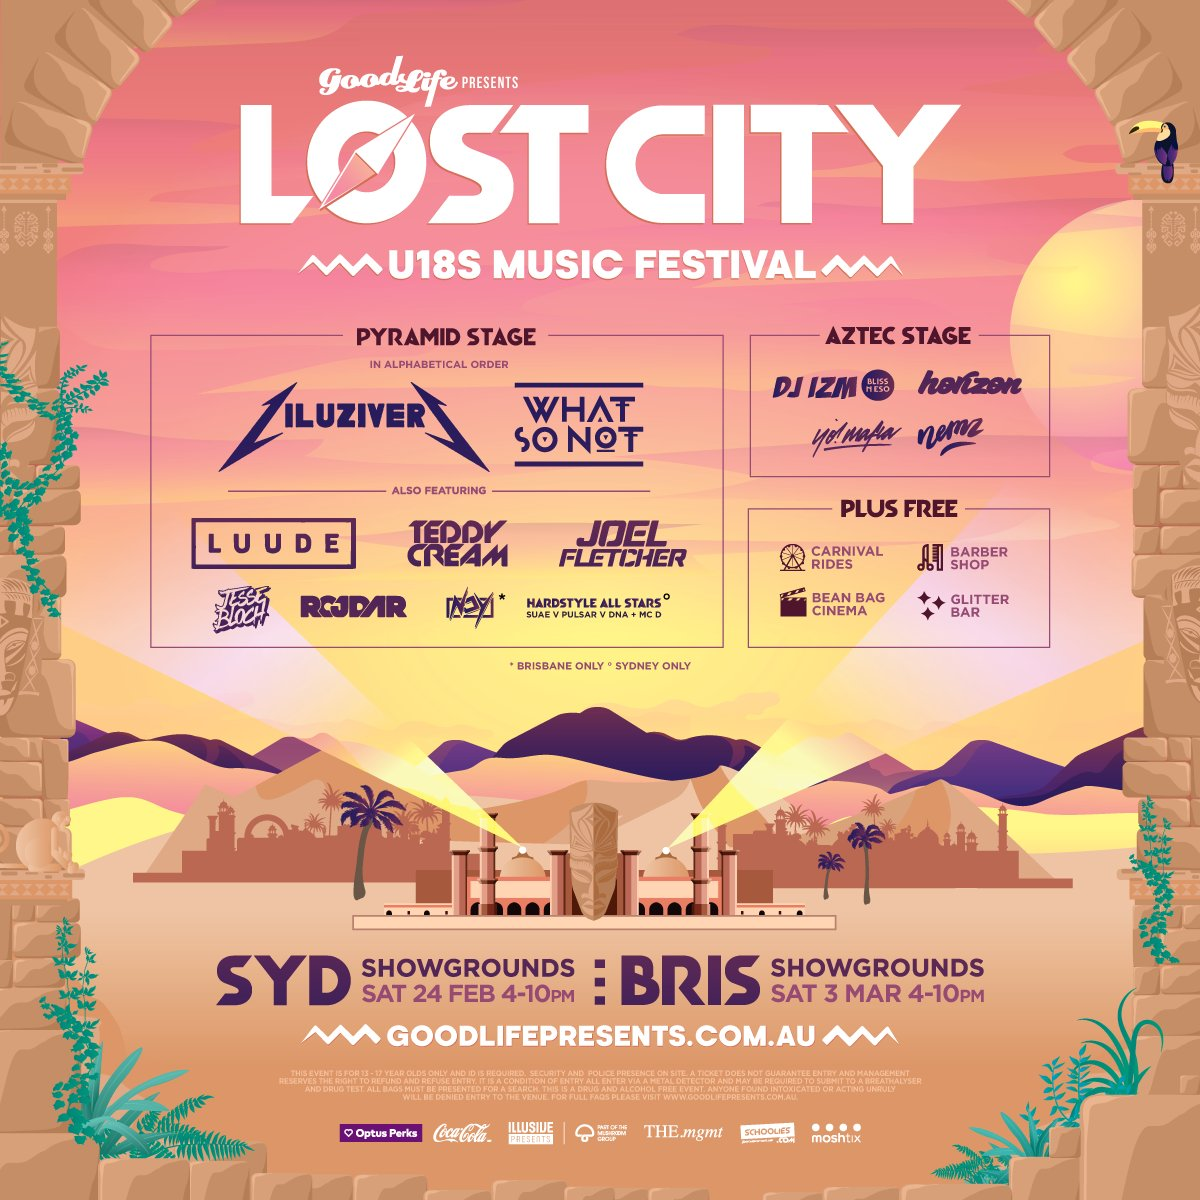 Lost City U 18s Festival Goodlifepresent Twitter